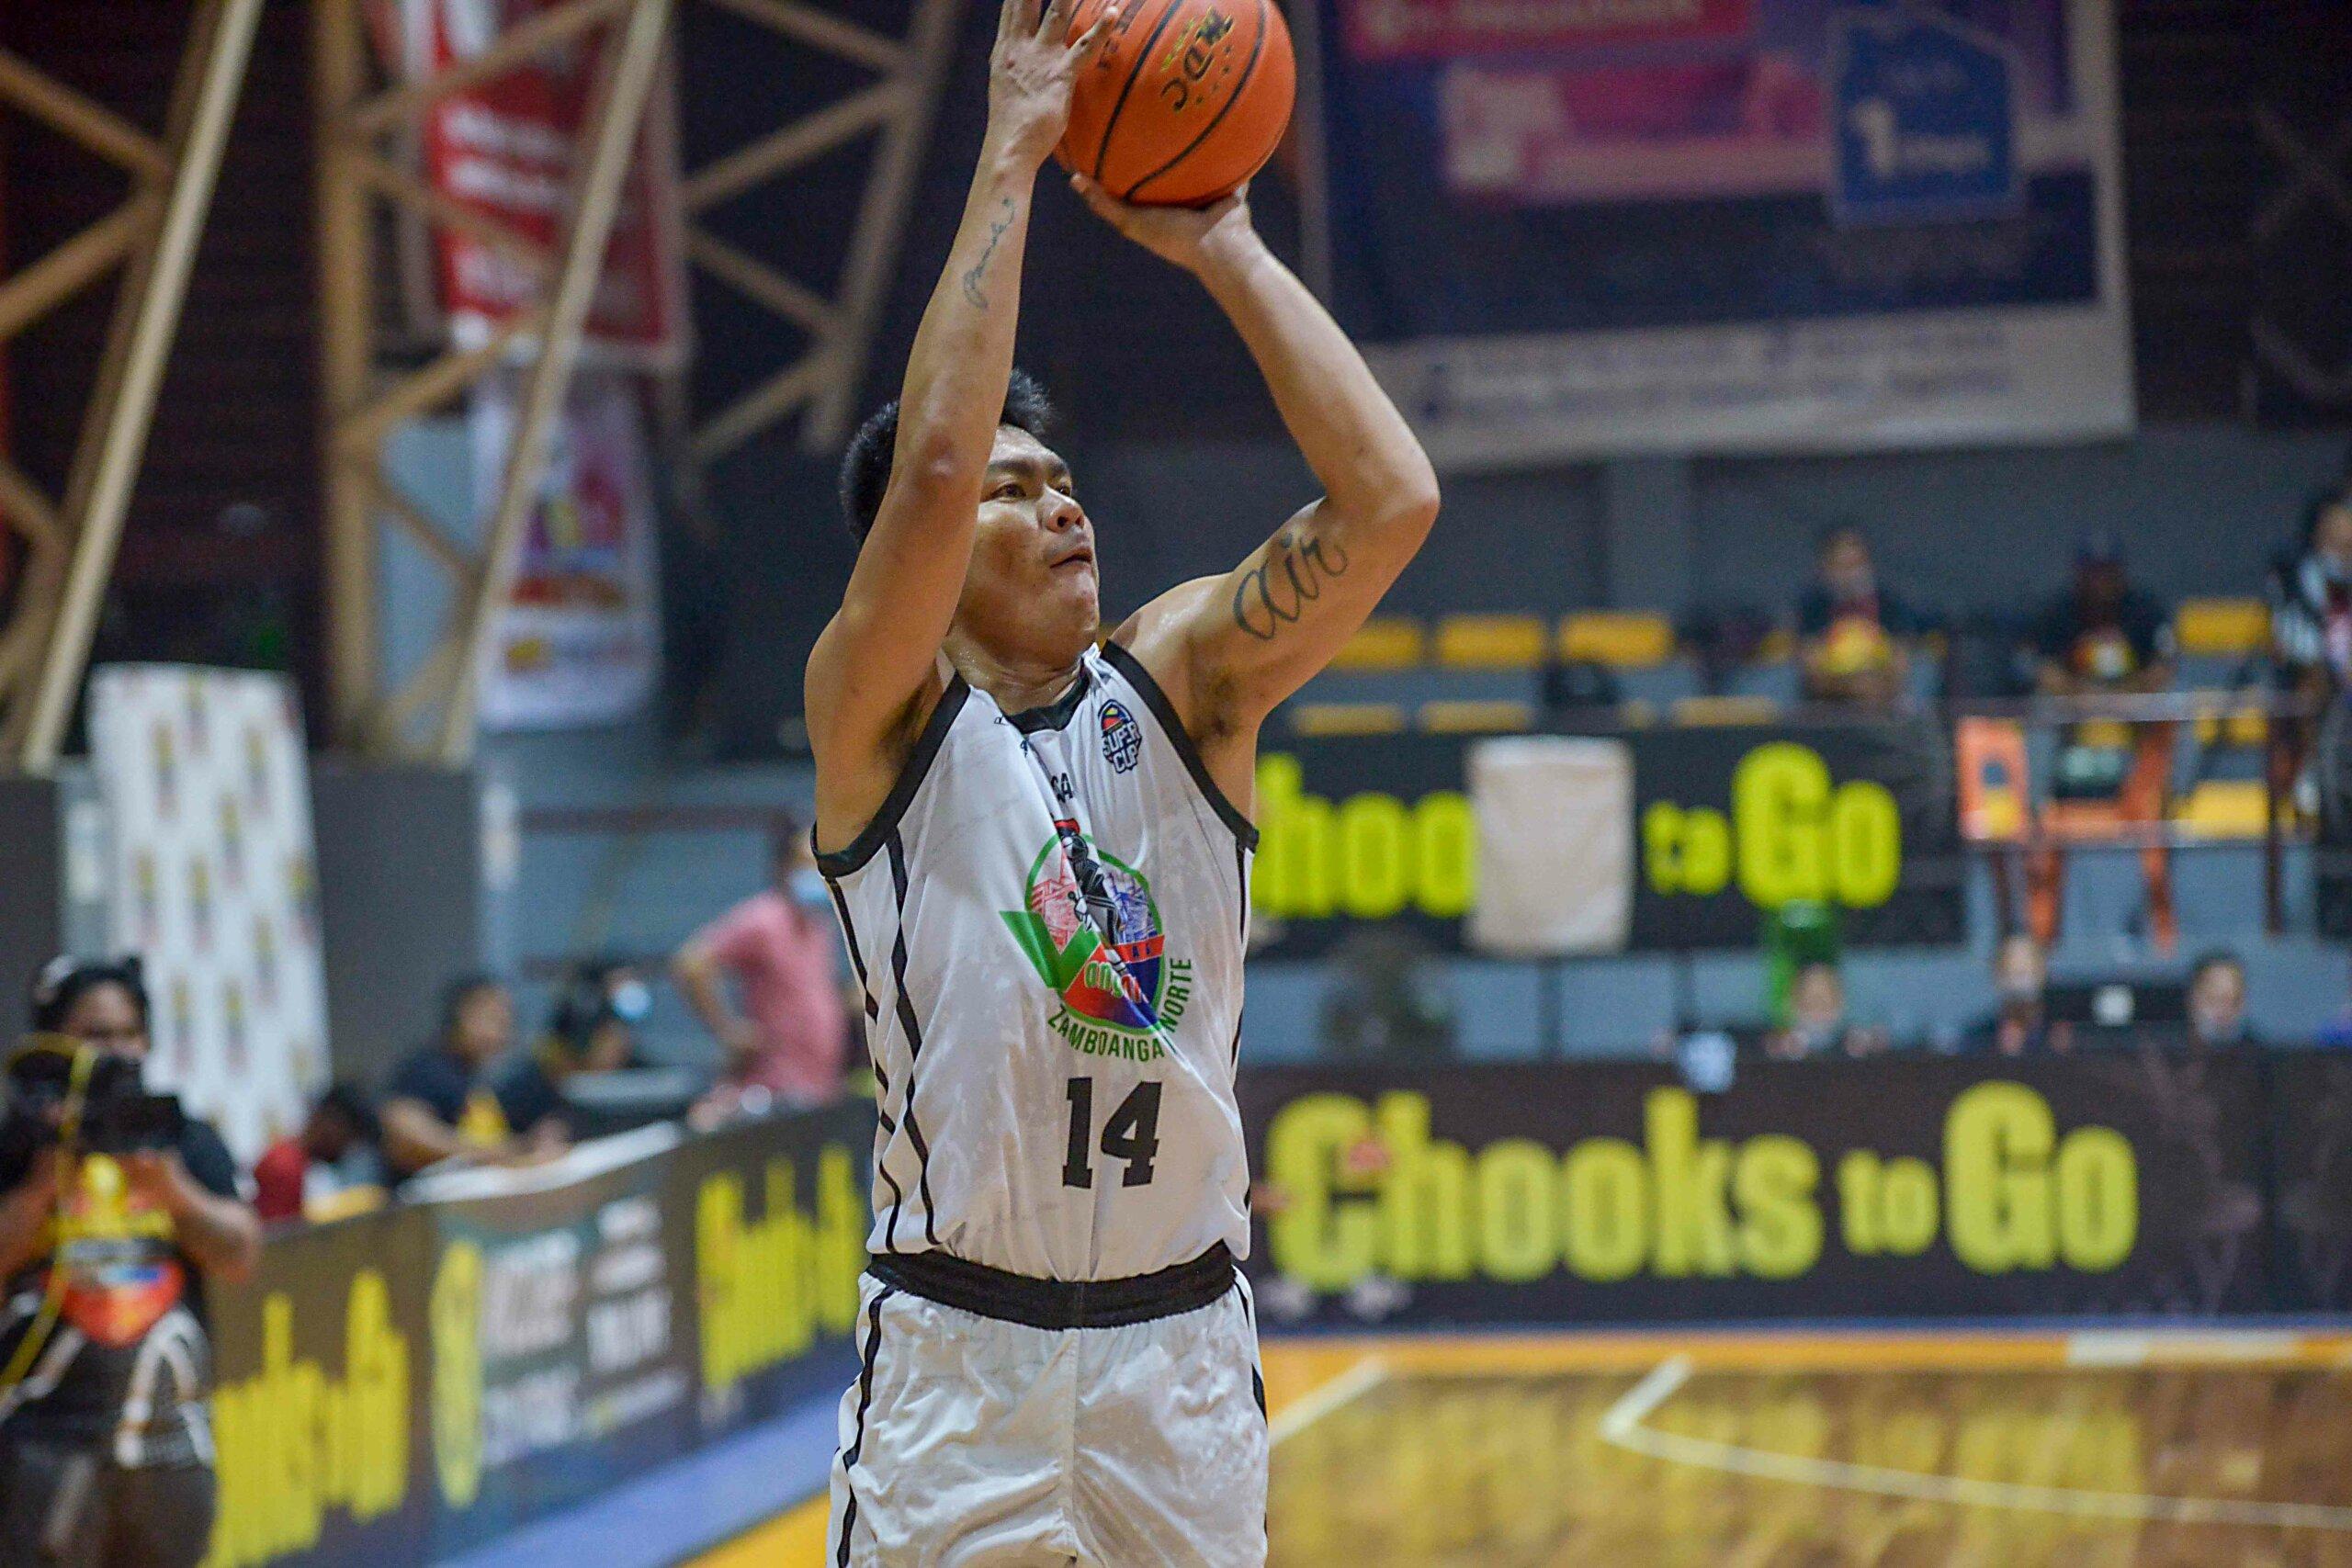 2021-Chooks-VisMin-Mindanao-SF-2-Roxas-vs-Zamboanga-City-Leo-Najorda-scaled Chito Jaime comes back just in nick of time for Roxas Basketball News VisMin Super Cup  - philippine sports news